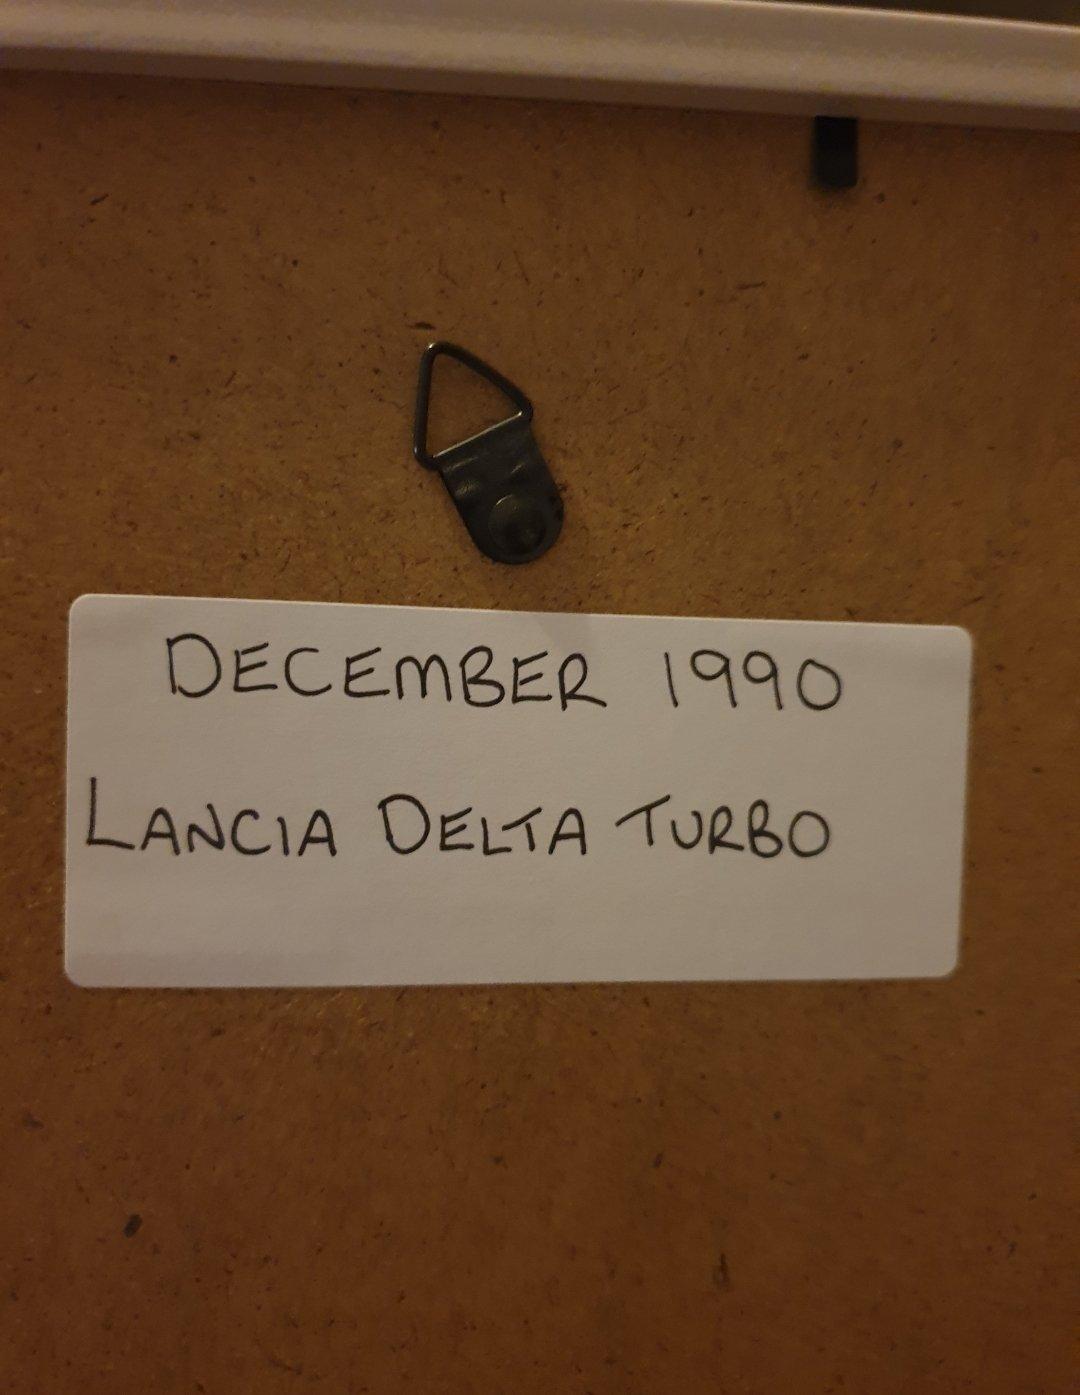 1990 Lancia Delta Turbo Advert Original  For Sale (picture 2 of 2)